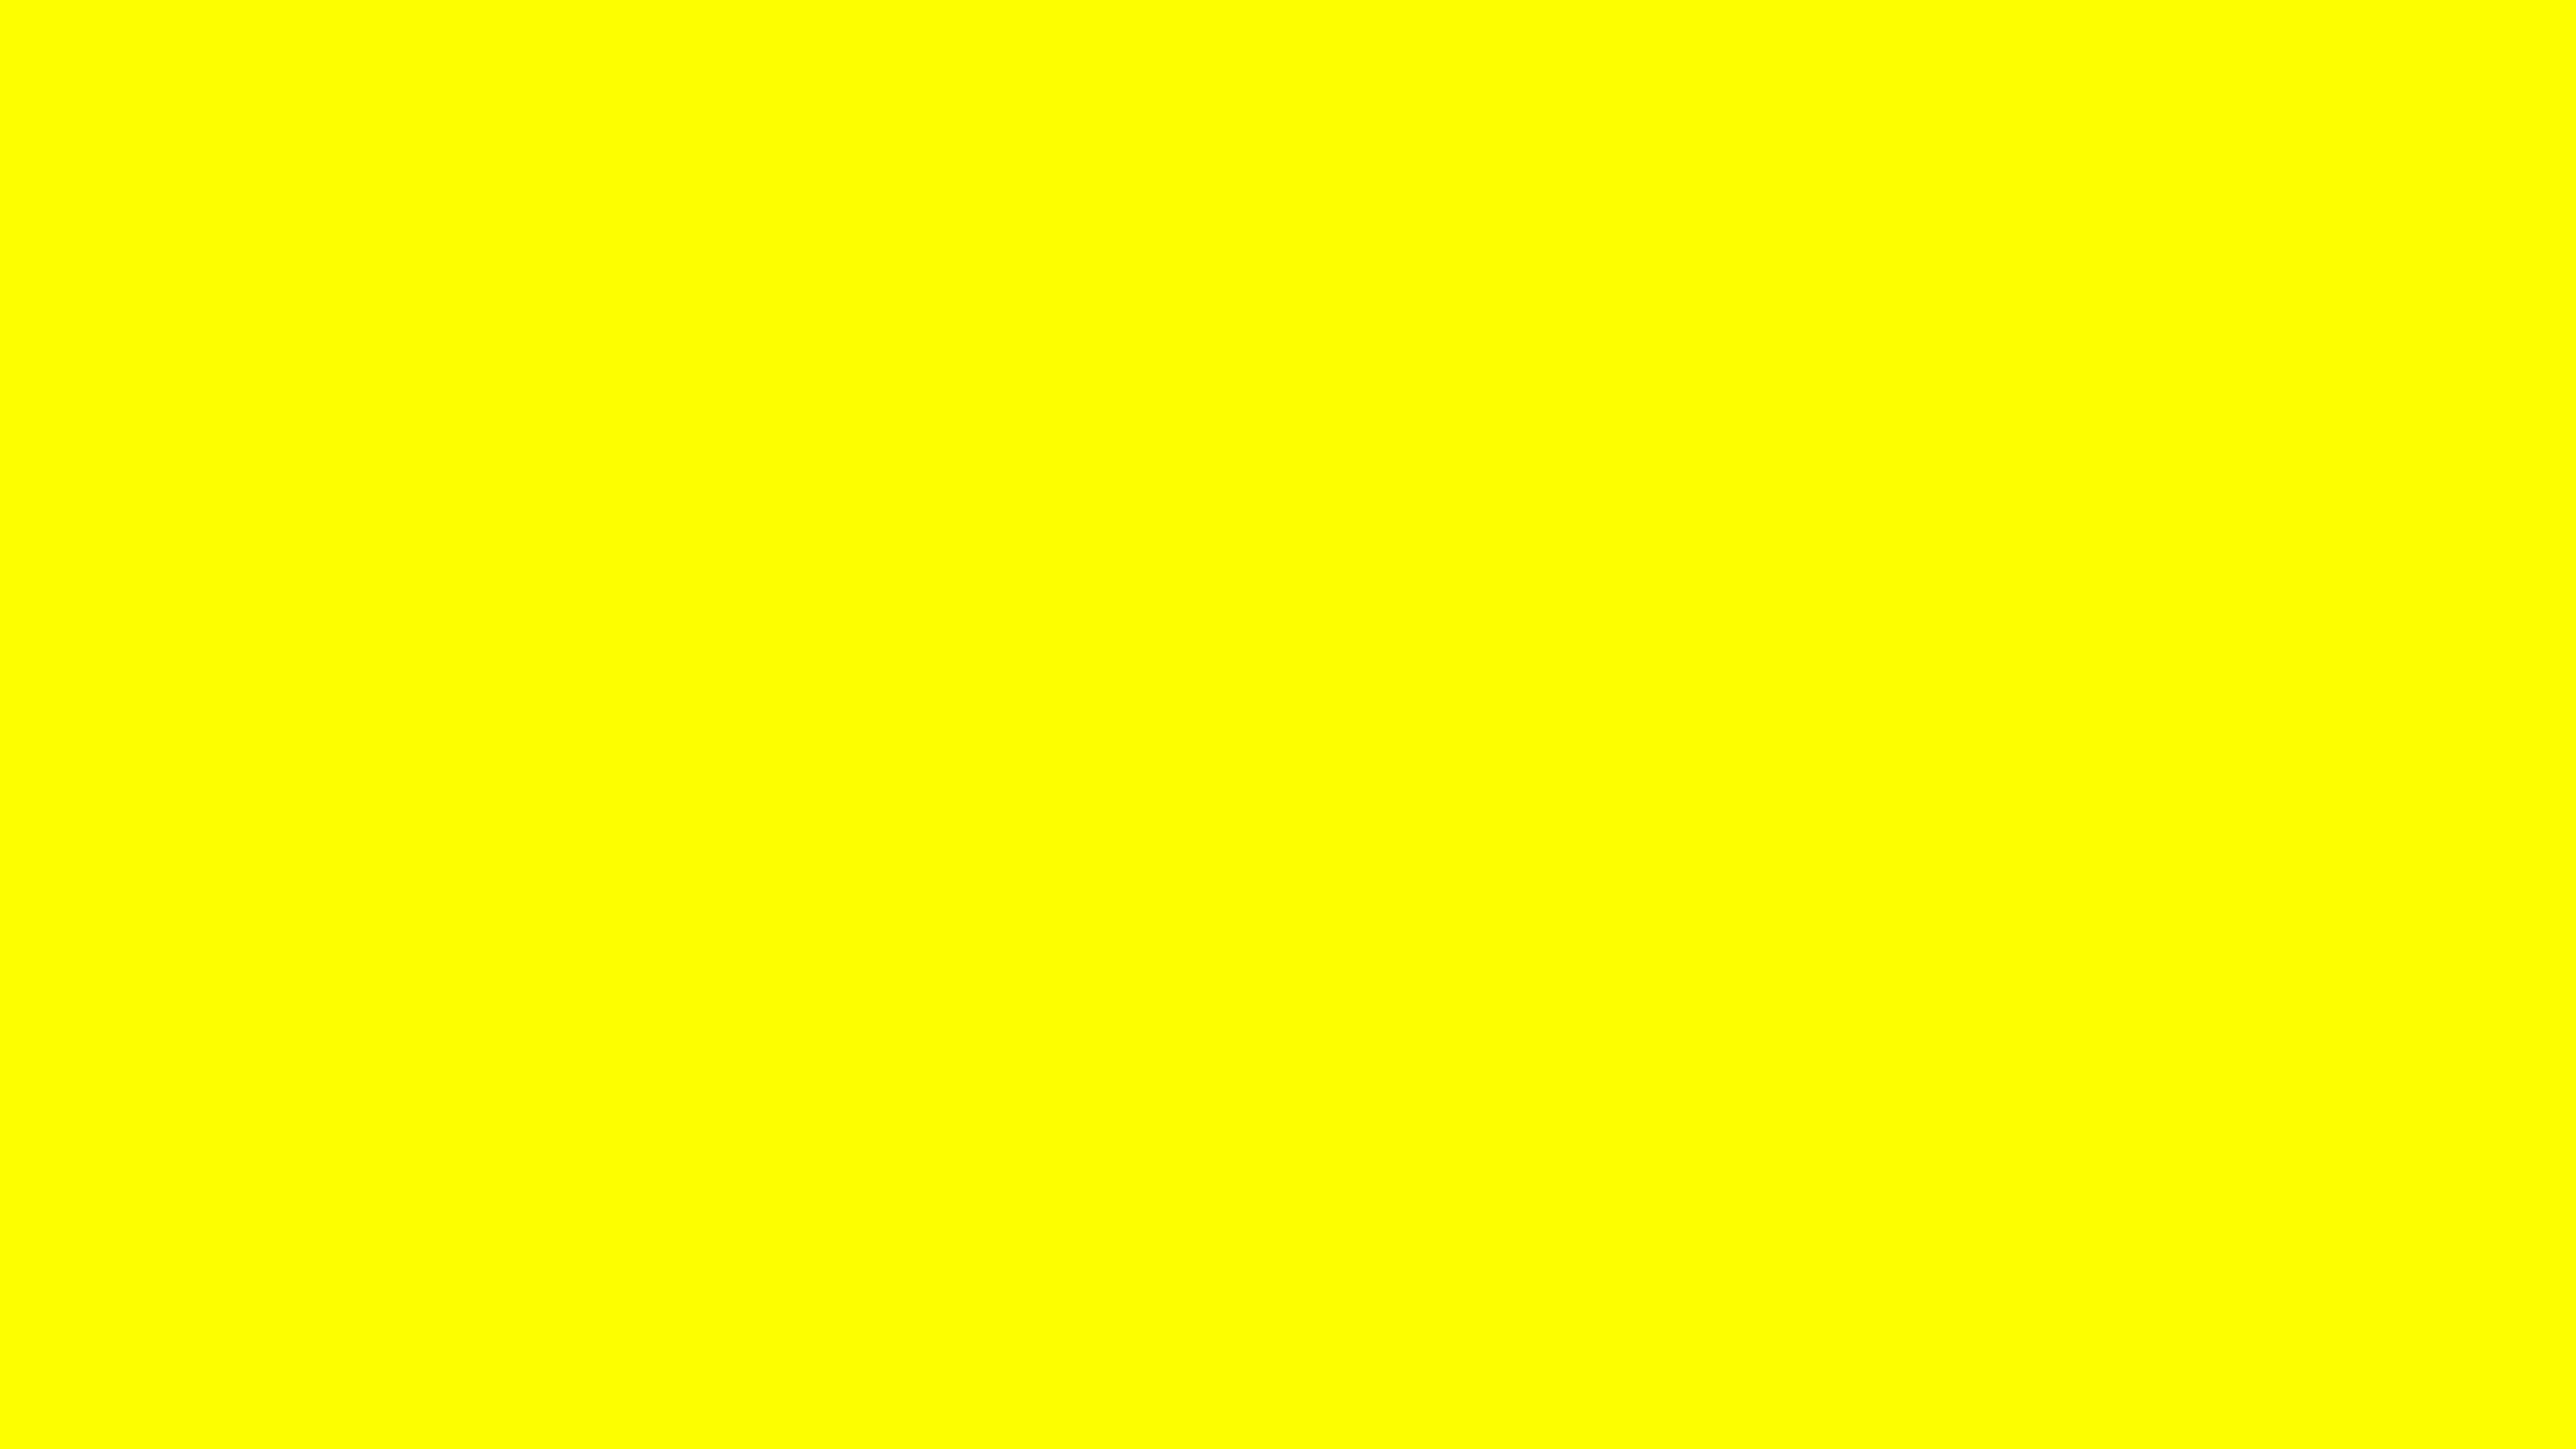 7680x4320 Lemon Glacier Solid Color Background